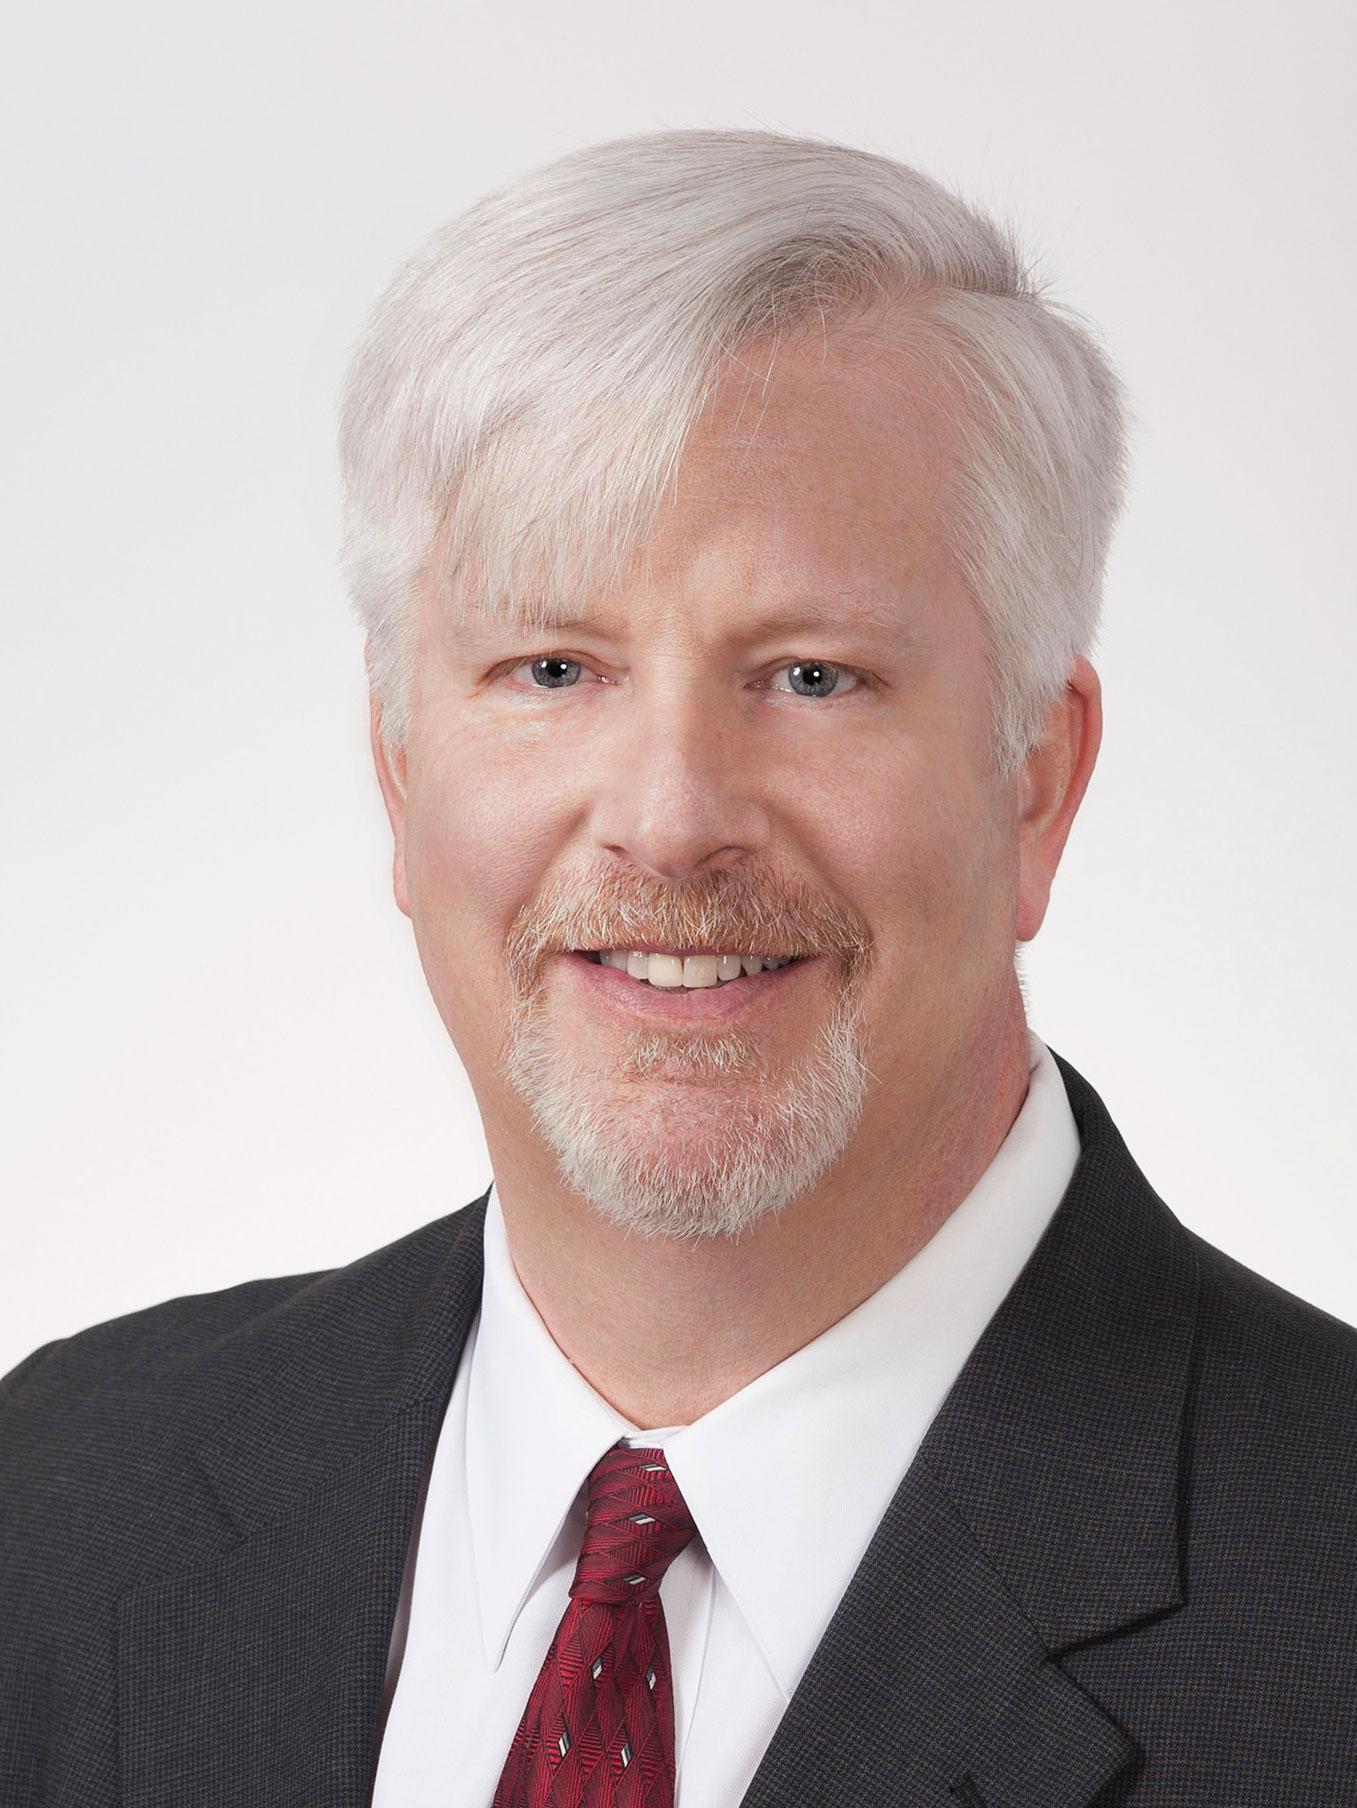 P. Arthur Huprich, CMT, Chief Market Technician at Day Hagan Mutual Funds in Sarasota, FL.